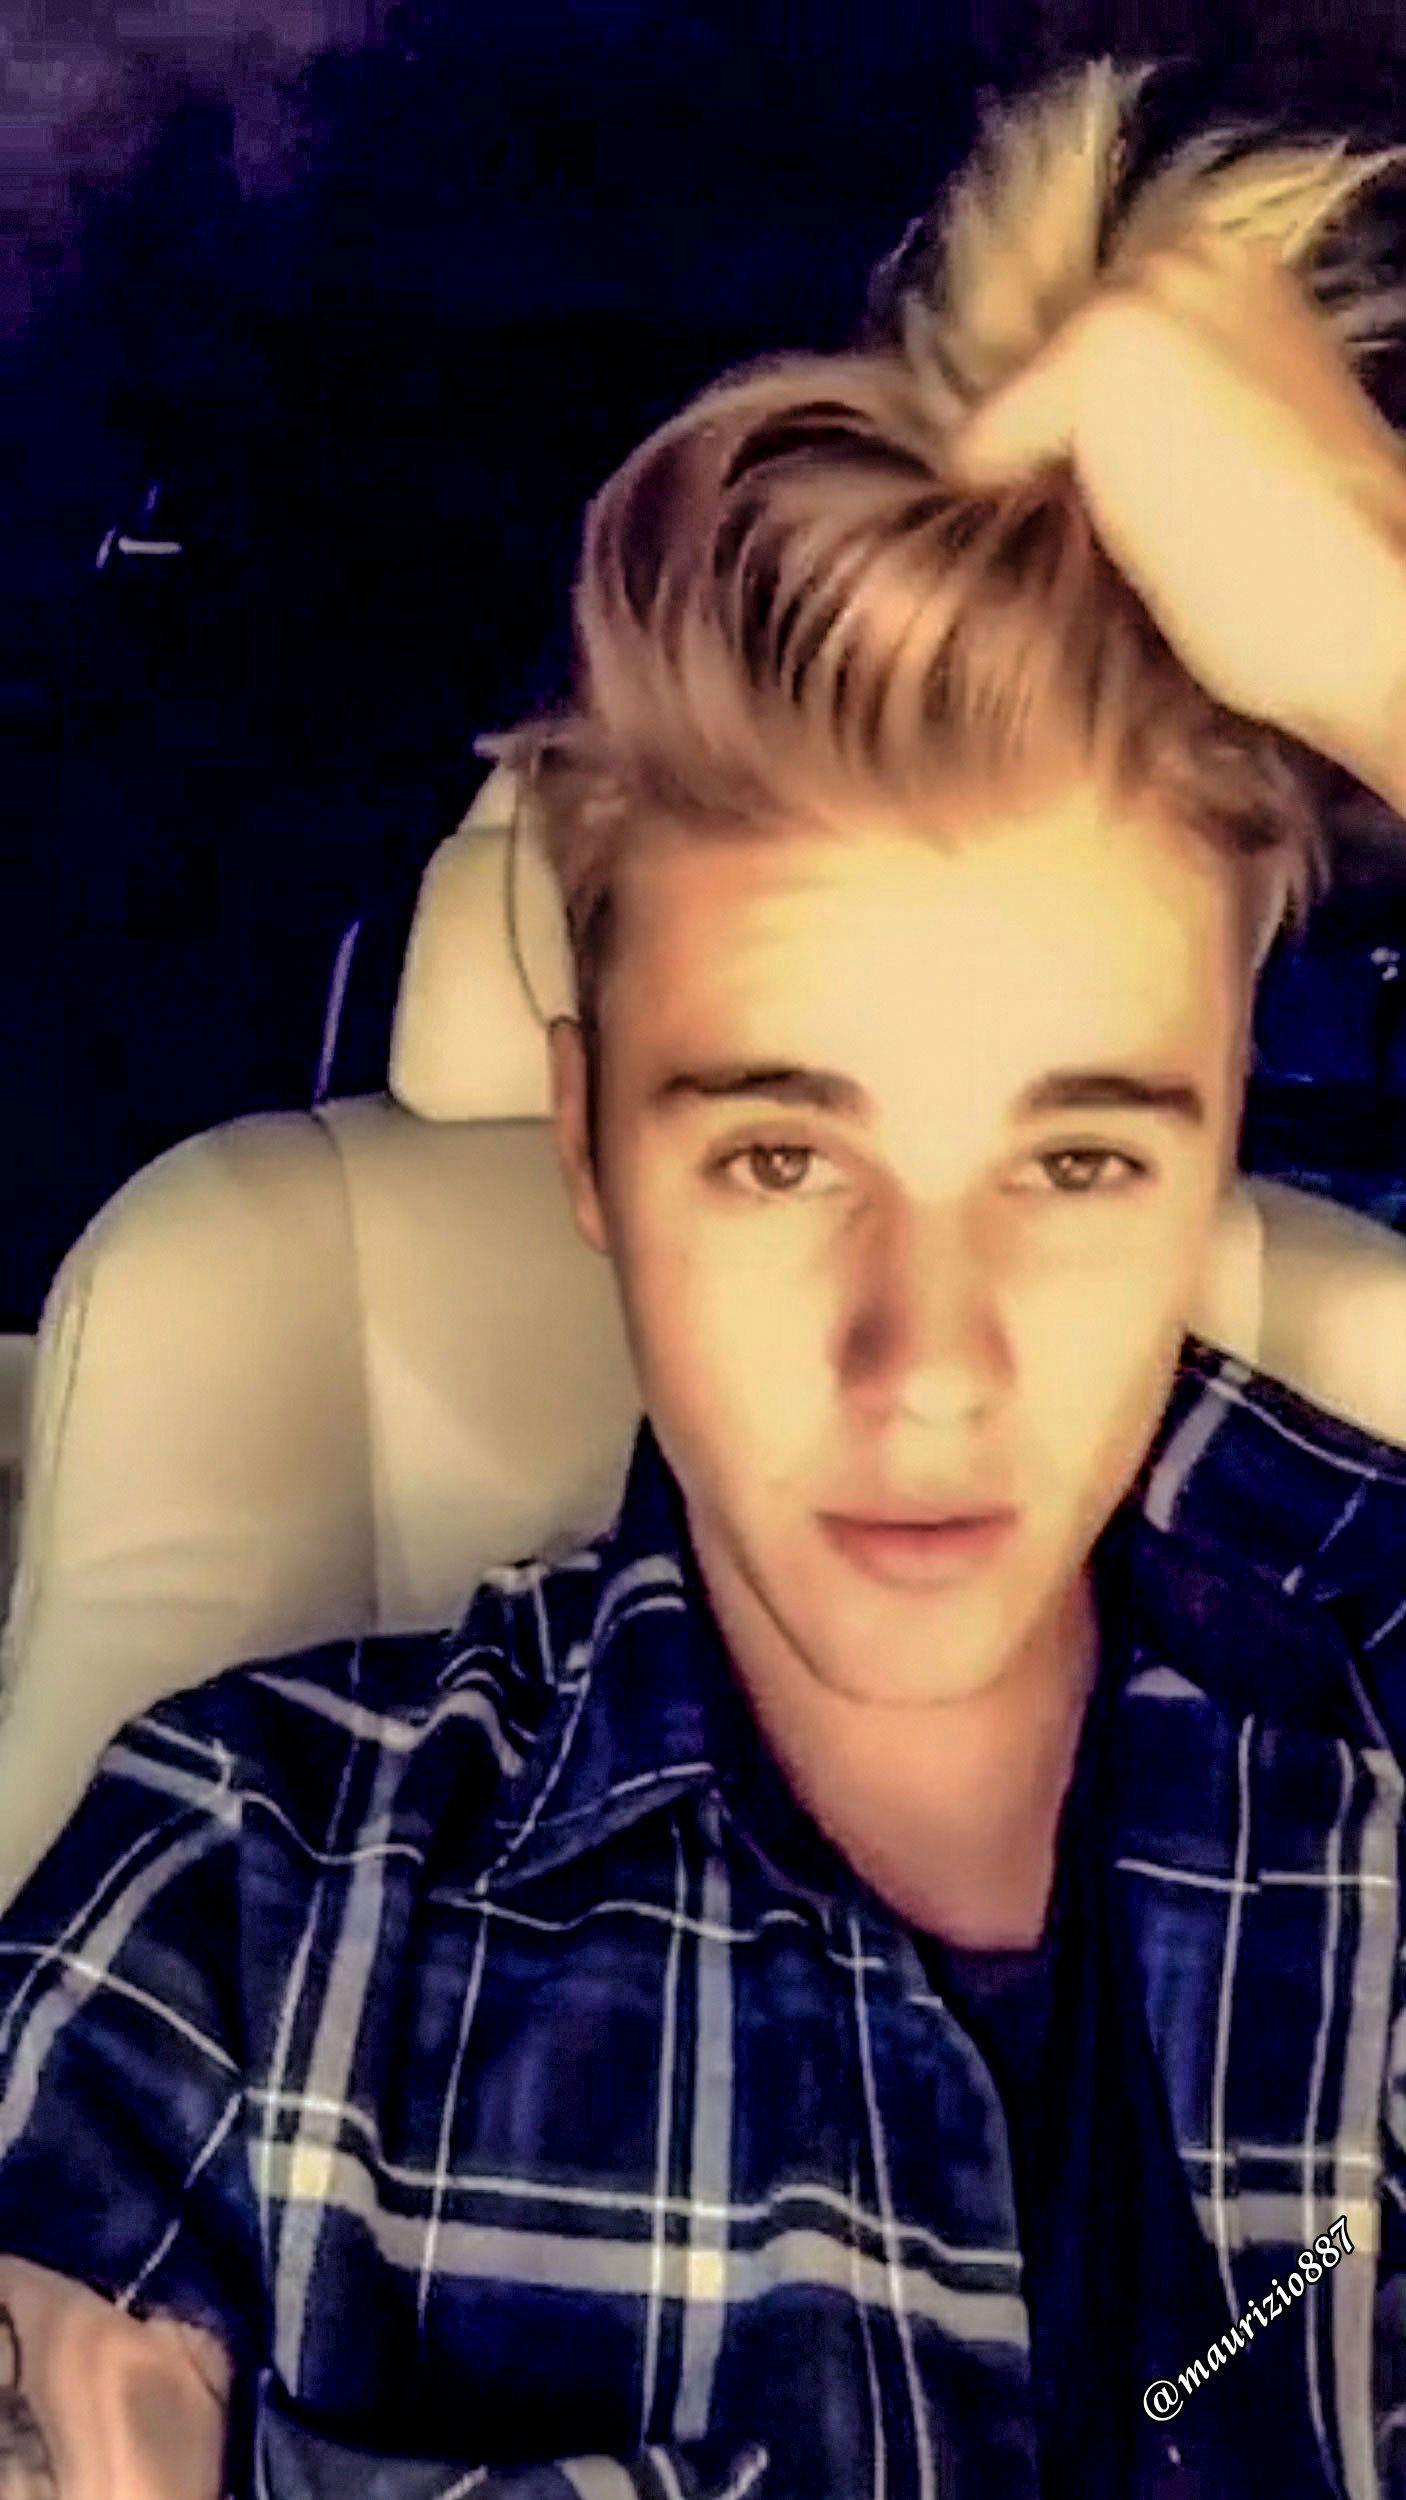 justin bieber 2015 - Justin Bieber photo (38598777) - fanpop: http://fr.fanpop.com/clubs/justin-bieber/images/38598777/title/justin-bieber-2015-photo